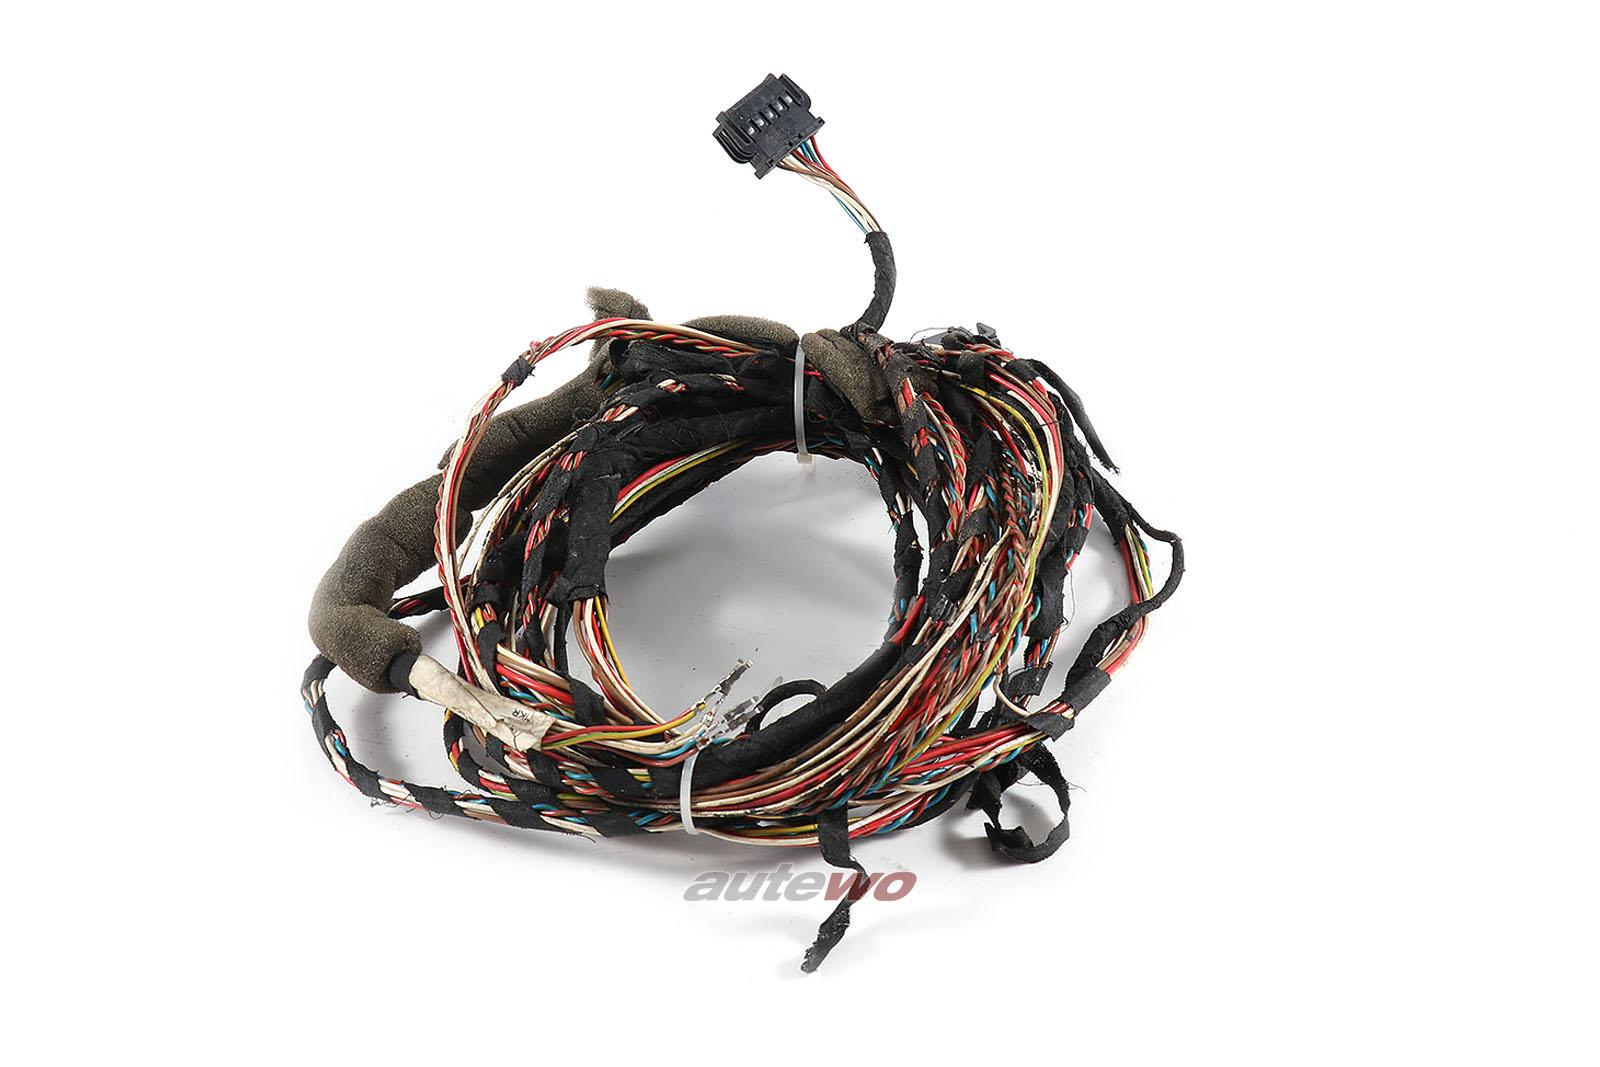 893971071CC Audi 90/Coupe Typ 89 5 Zylinder Kabelbaum Beleuchtung Vorne